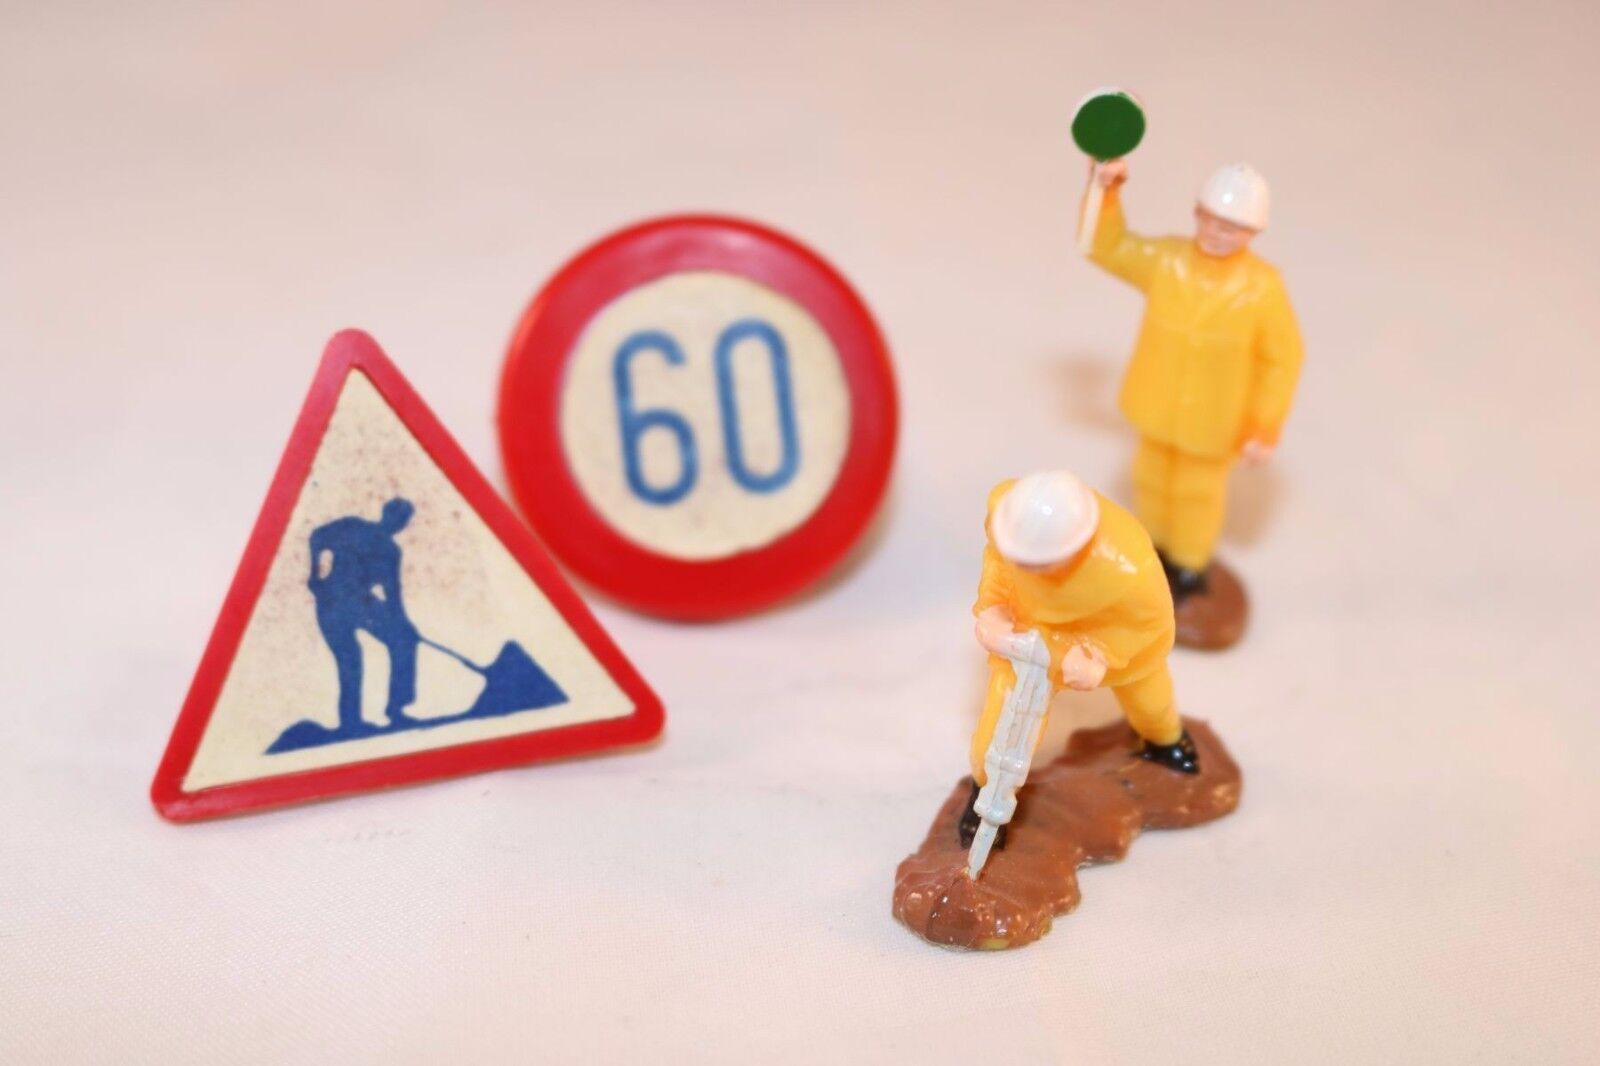 Dinky Toys 570A 570 A  Autgoldutes original figures workmen and traffic signs